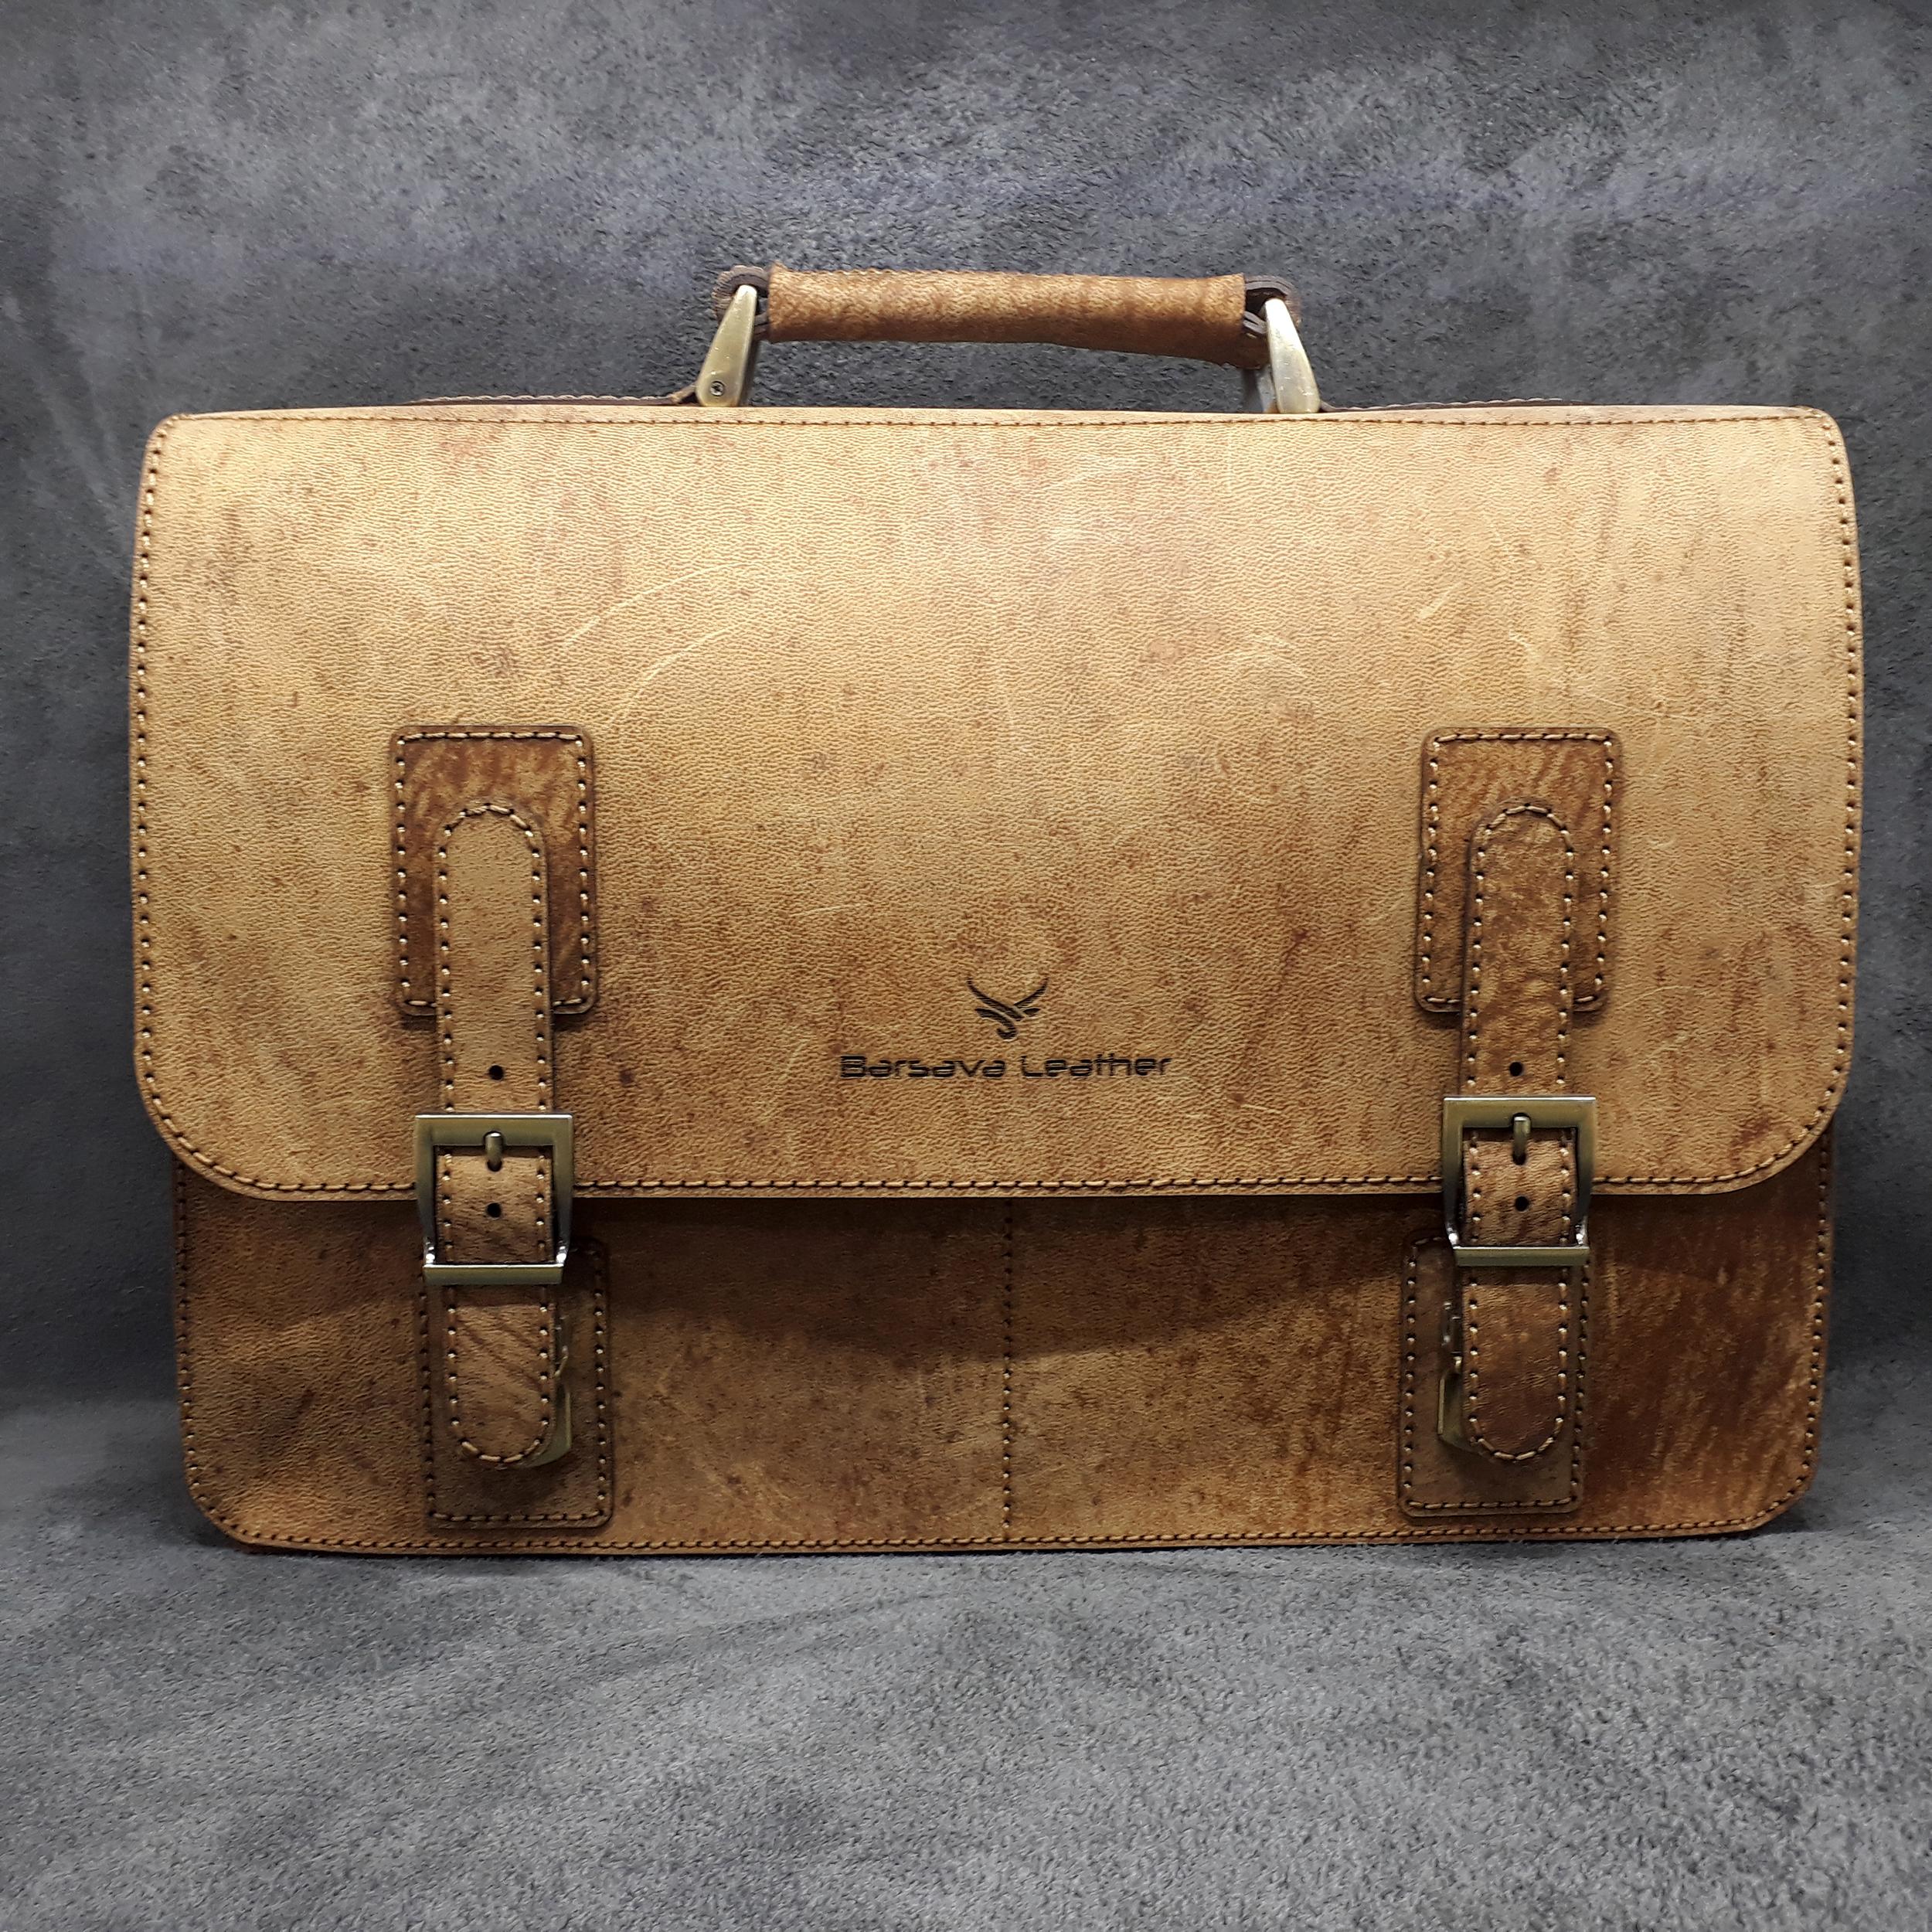 کیف اداری مردانه چرم بارثاوا مدل 1106a